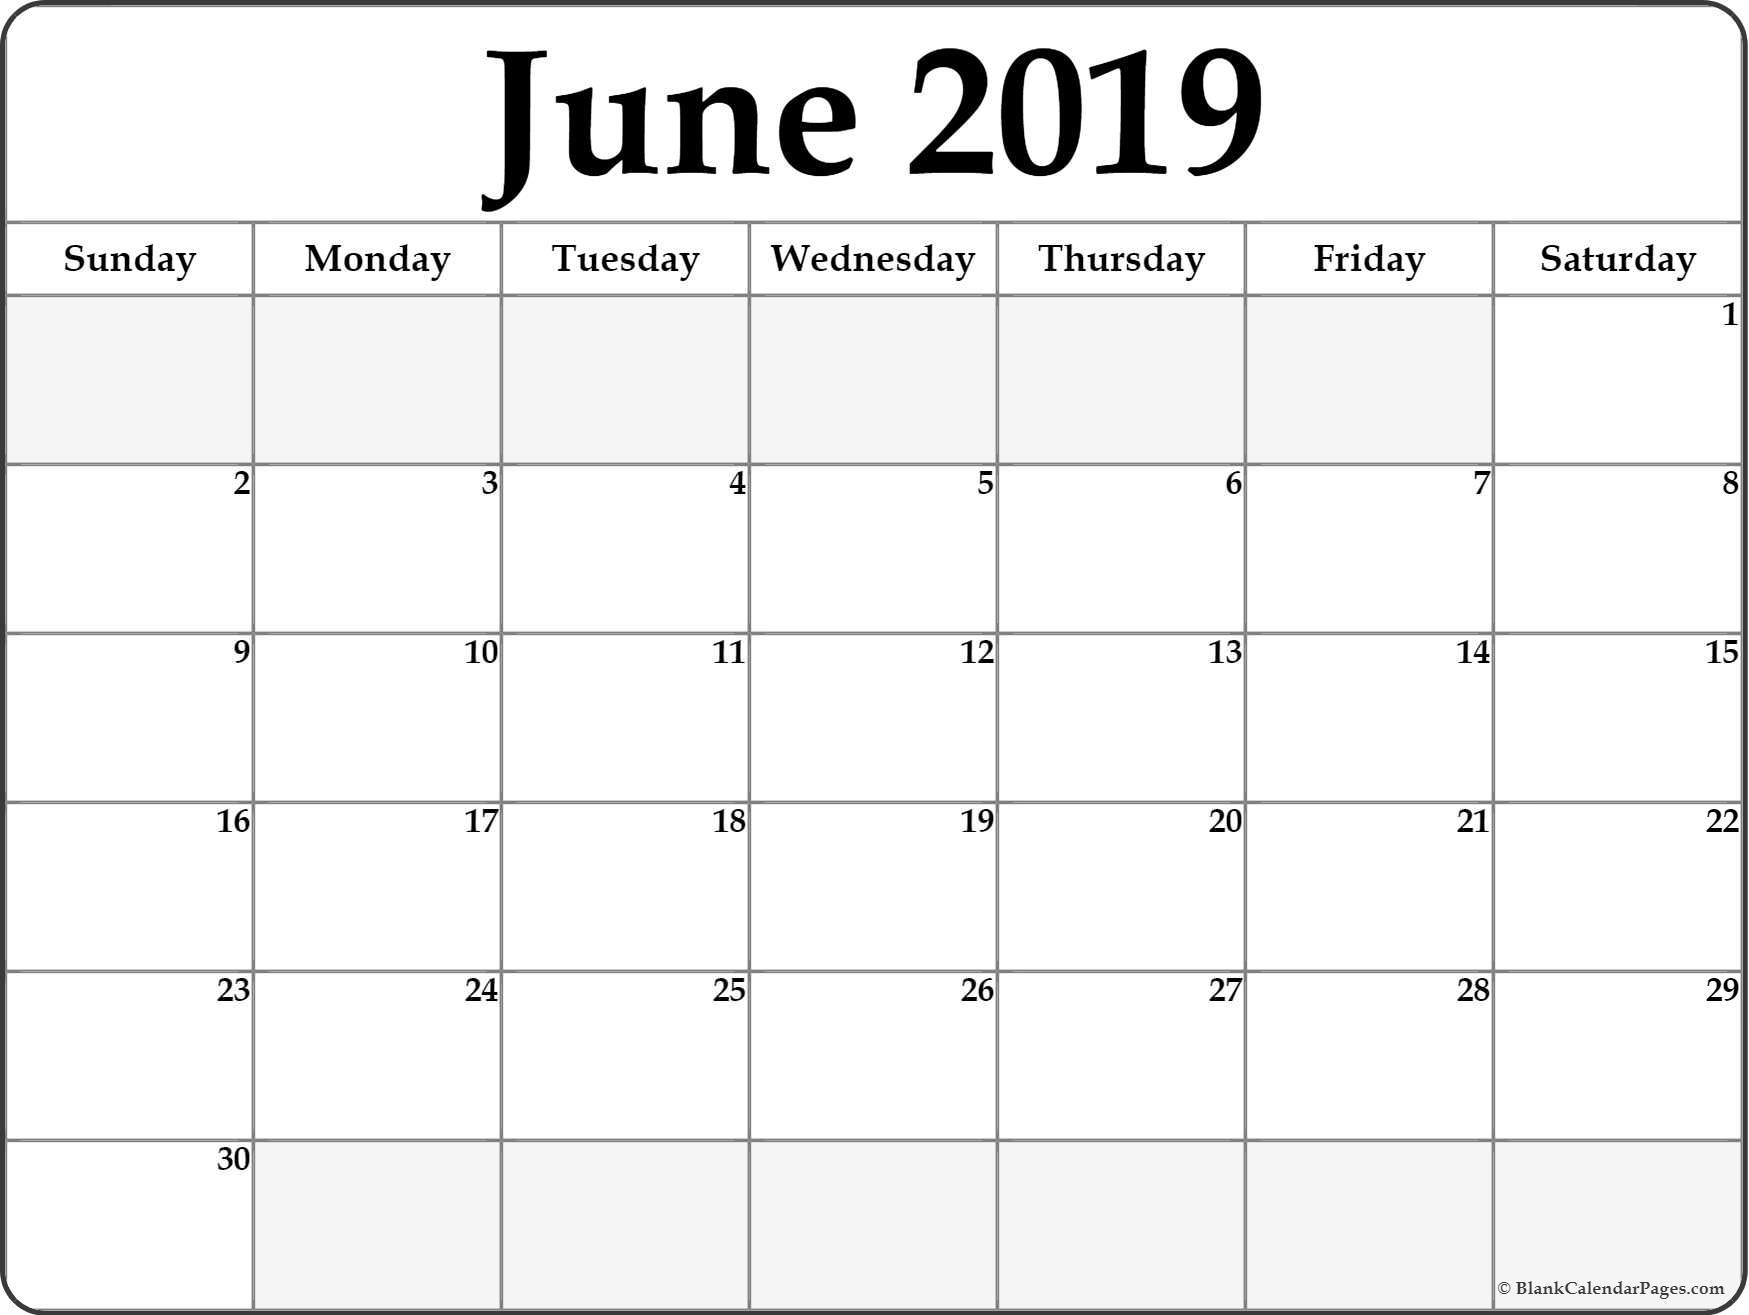 June 2019 Calendar | Free Printable Monthly Calendars throughout Printable Weekly Calendar Template July